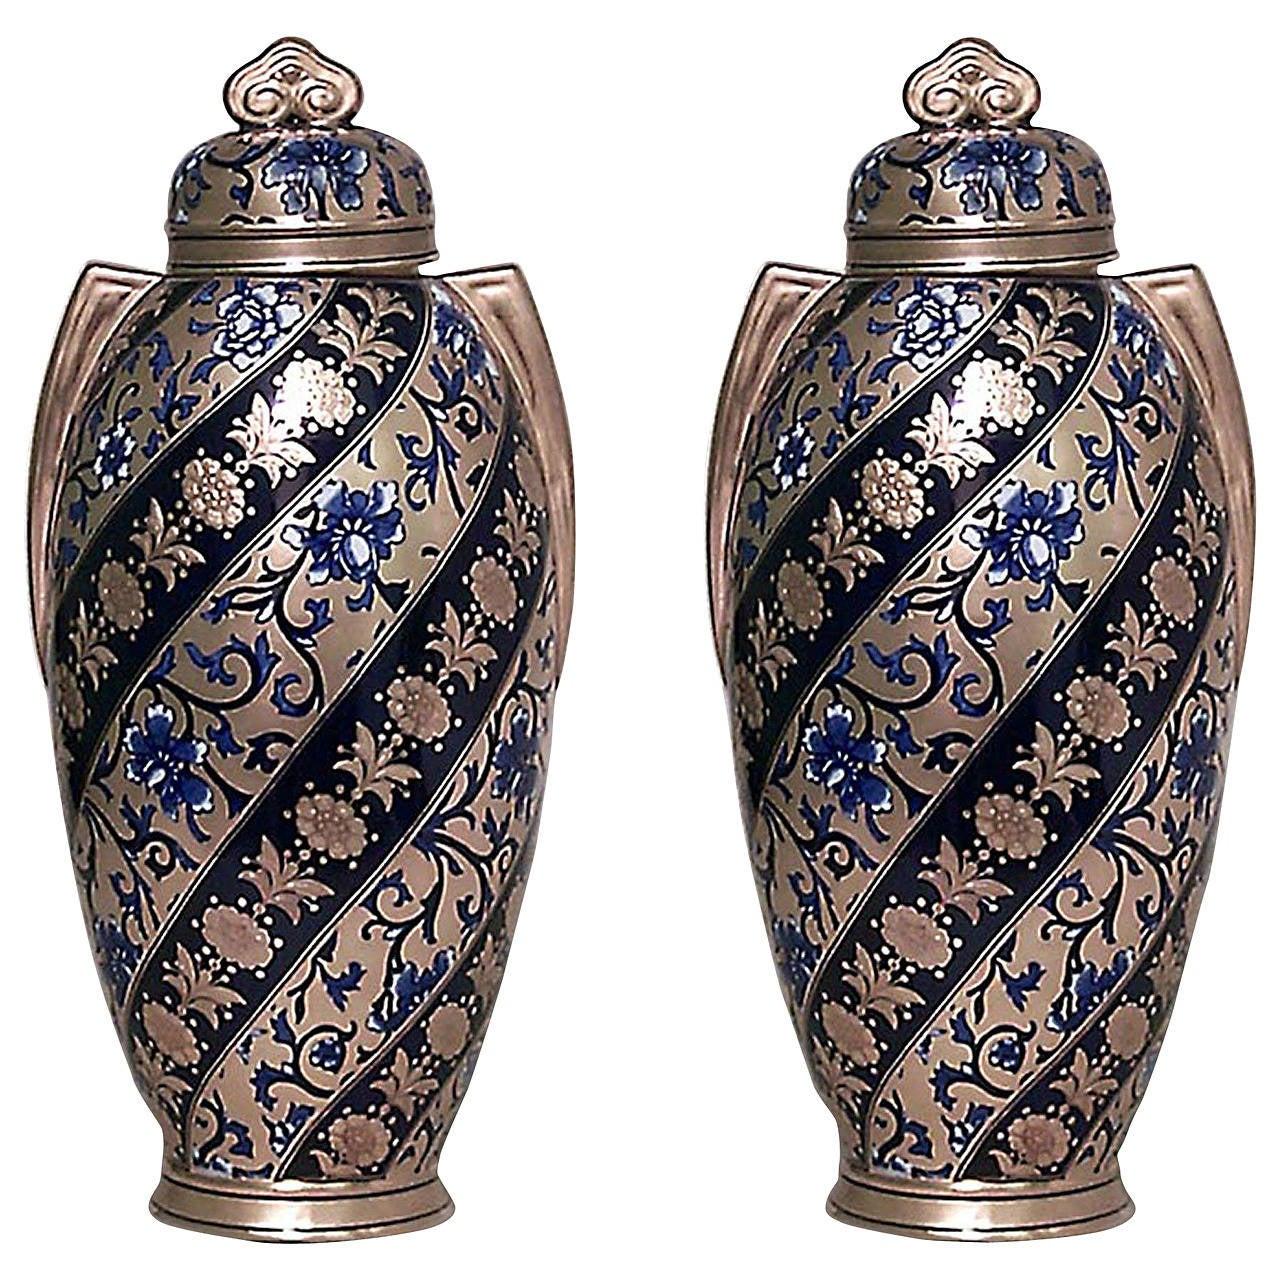 Pair of 19th Century English Swirled Coalport Porcelain Vases For Sale